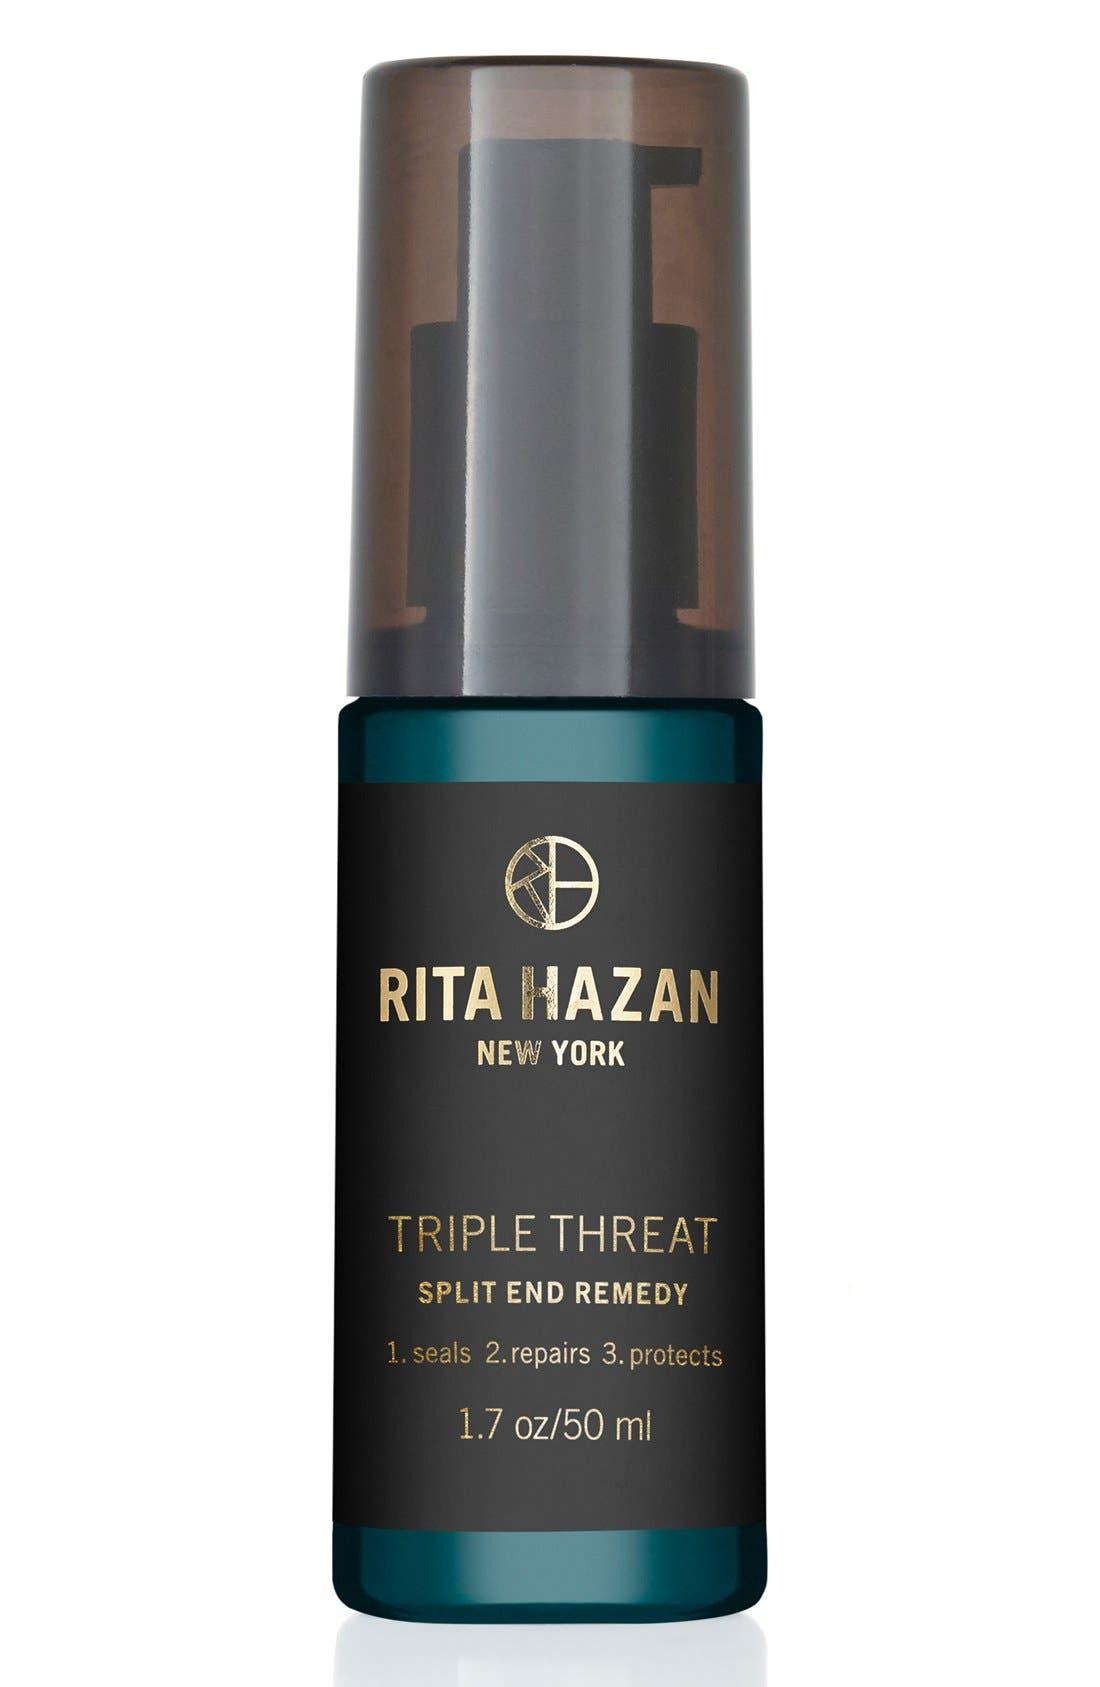 RITA HAZAN NEW YORK 'Triple Threat' Split End Remedy